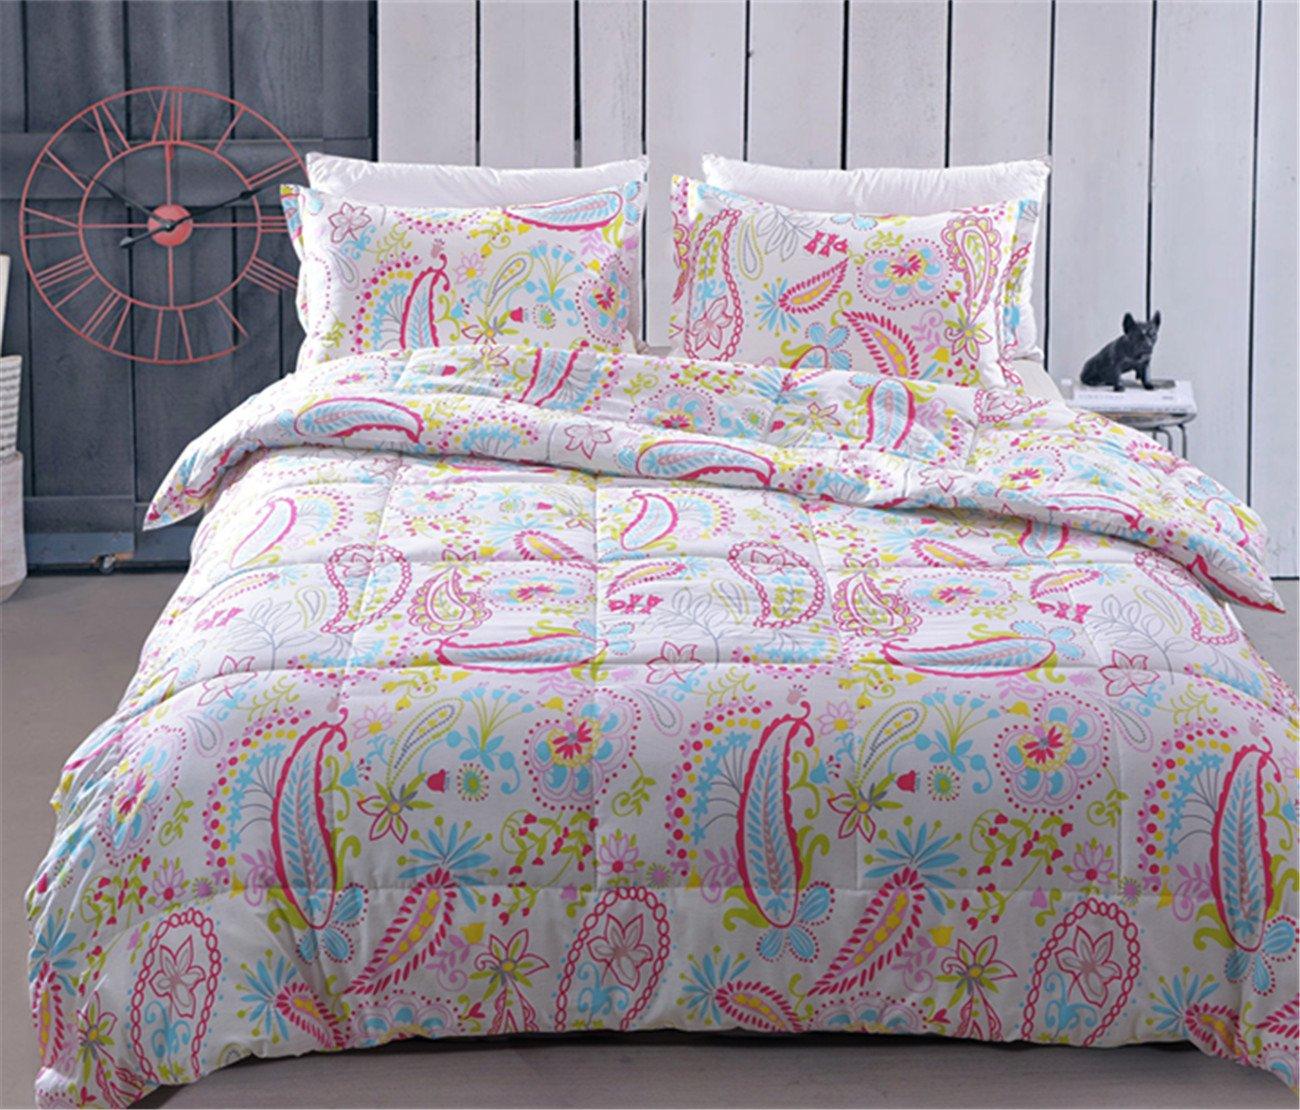 Juwenin Home Bedding Pink Girls Comforter Set with 2 Pillow sham 100% Cotton (CMF-BIANHUAKAI, Queen)